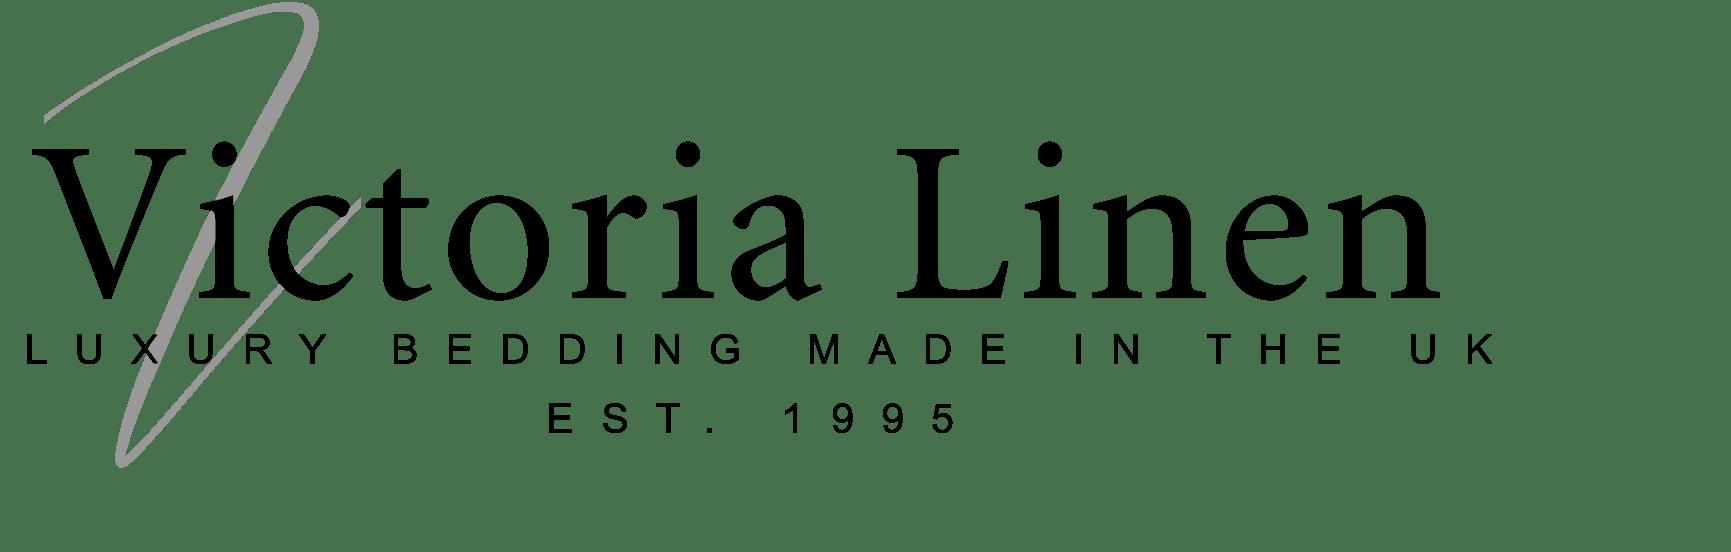 Victoria Linen Company Ltd